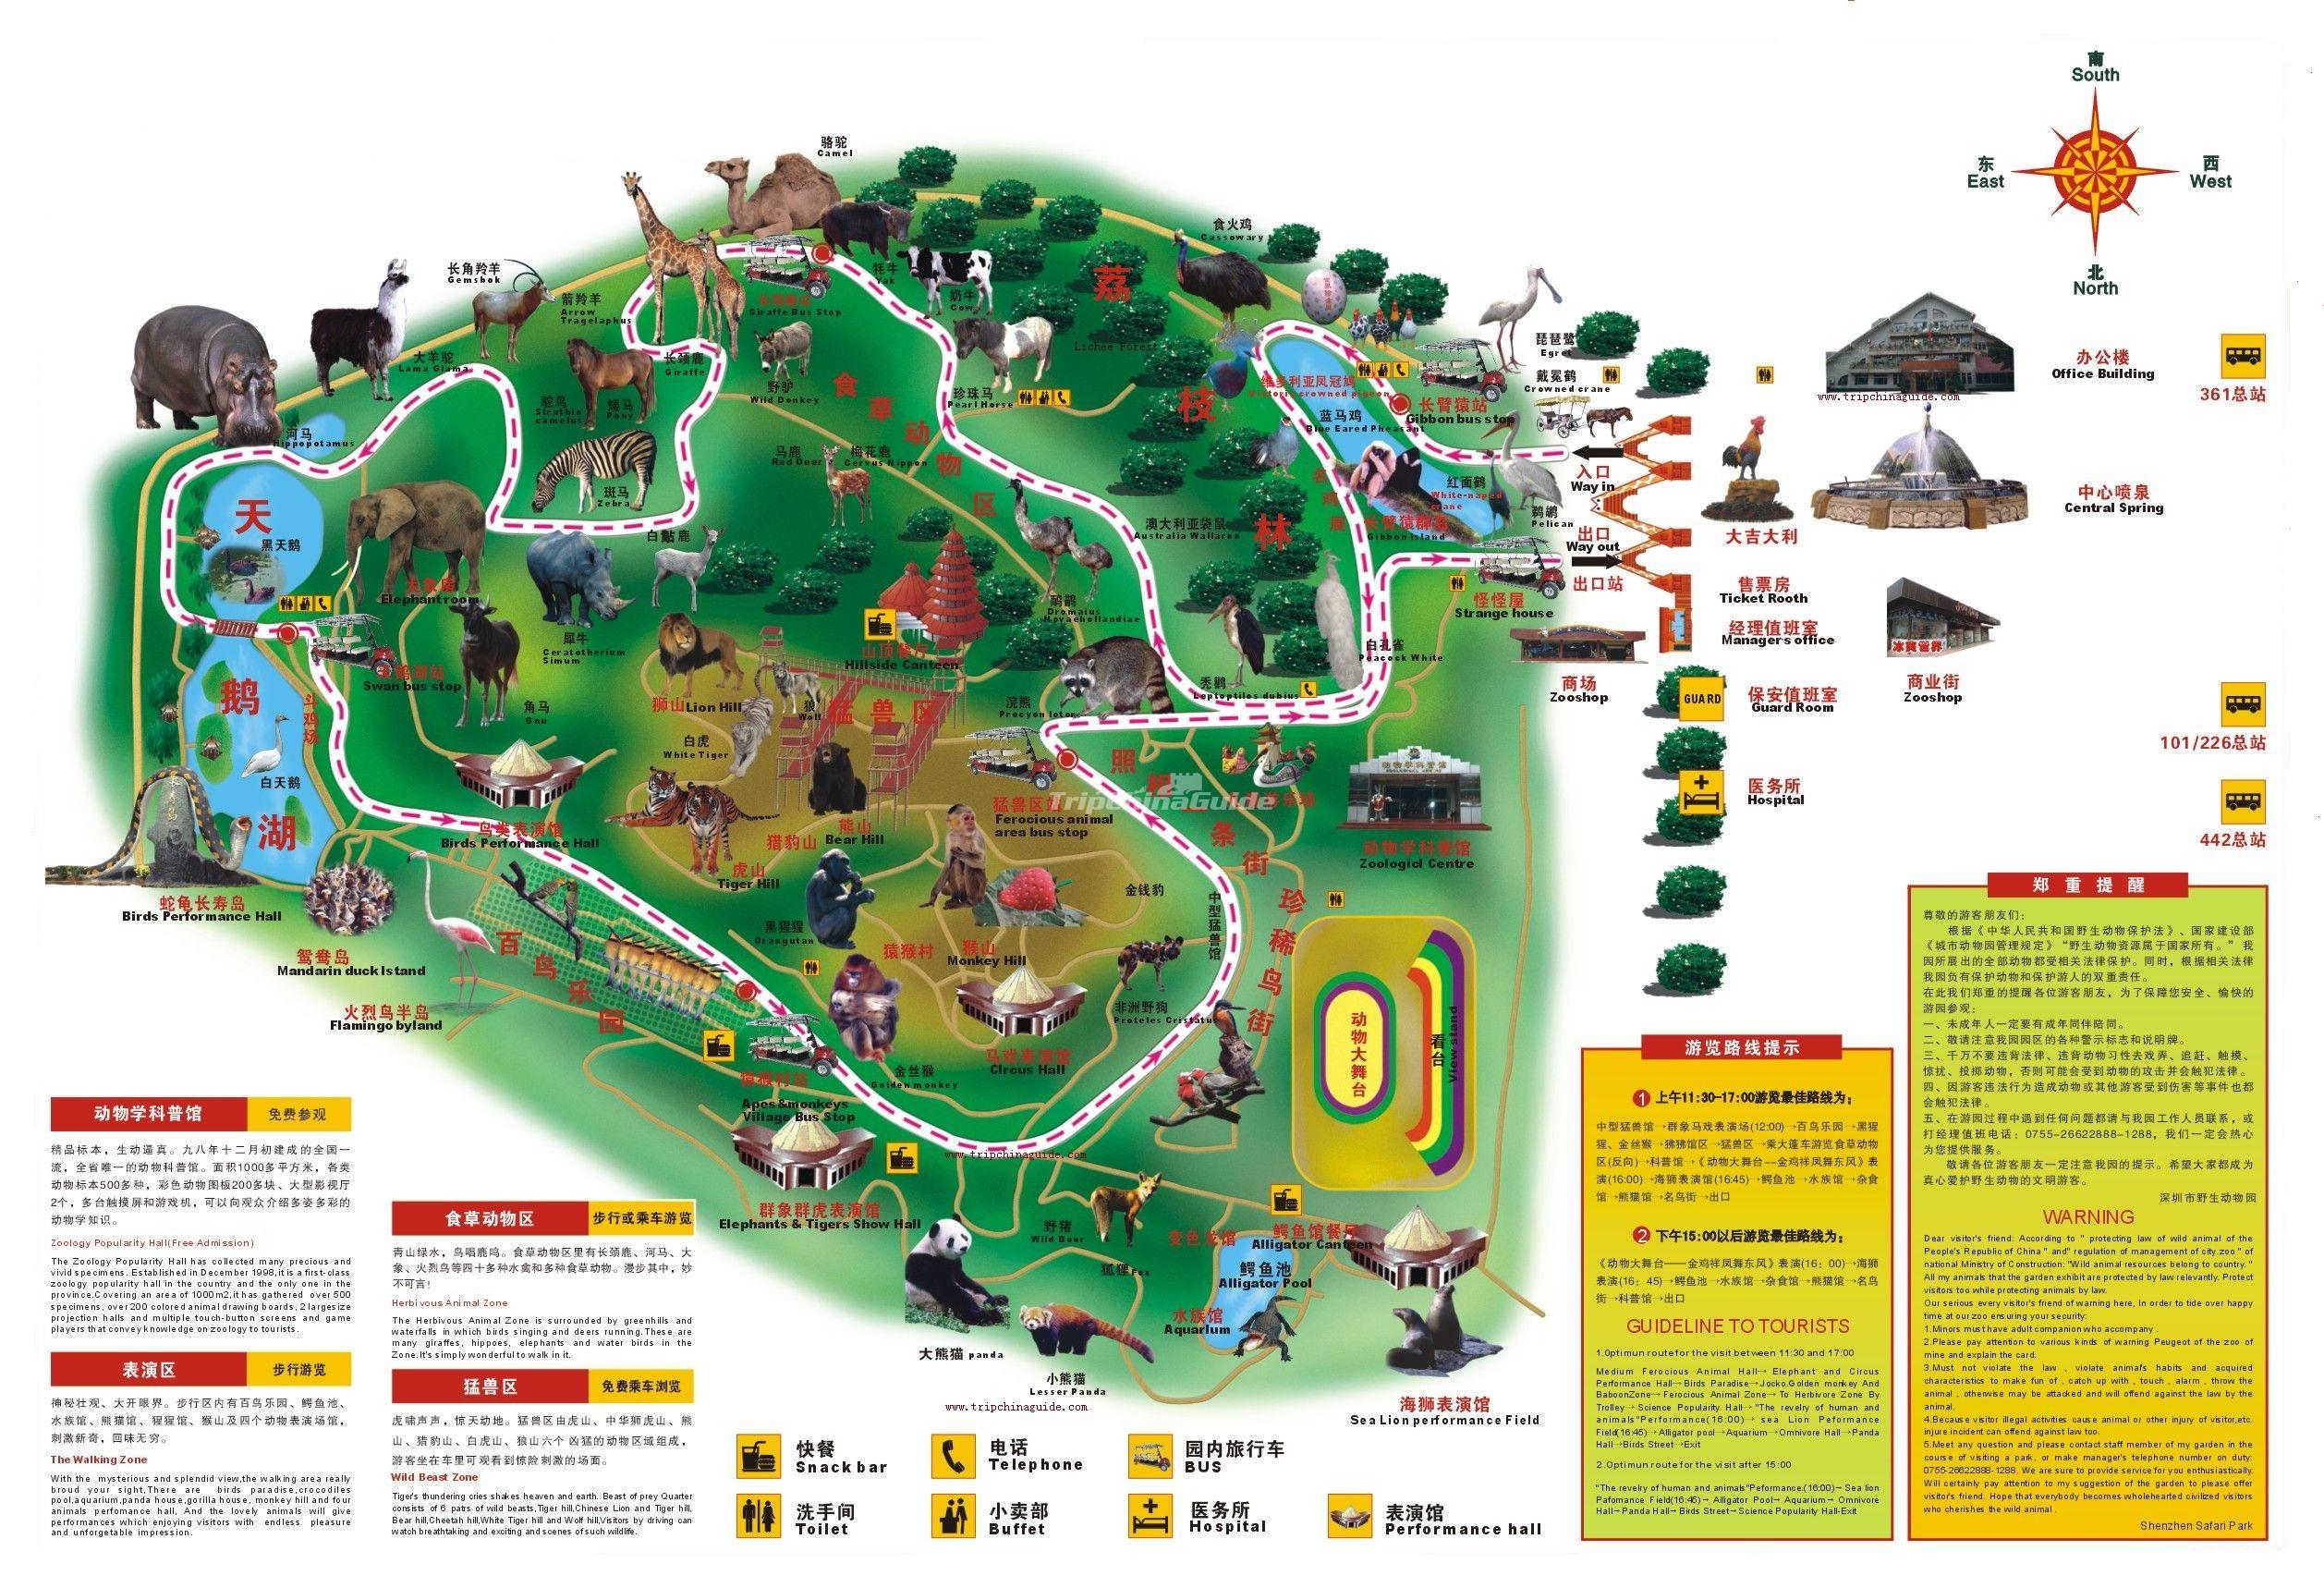 Shenzhen Safari Park Map - Maps of Shenzhen on adventure park map, ocean park hong kong map, water park map, kings dominion map, 2014 disney world map, river safari map, spa map, casino map, miramar air station map, six flags discovery kingdom map, zoo map, aquarium map, natural bridge wildlife ranch map, amusement parks usa map, parc safari map, disneyland map, aquatica san antonio map, wildlife safari map, night safari map, nairobi map,